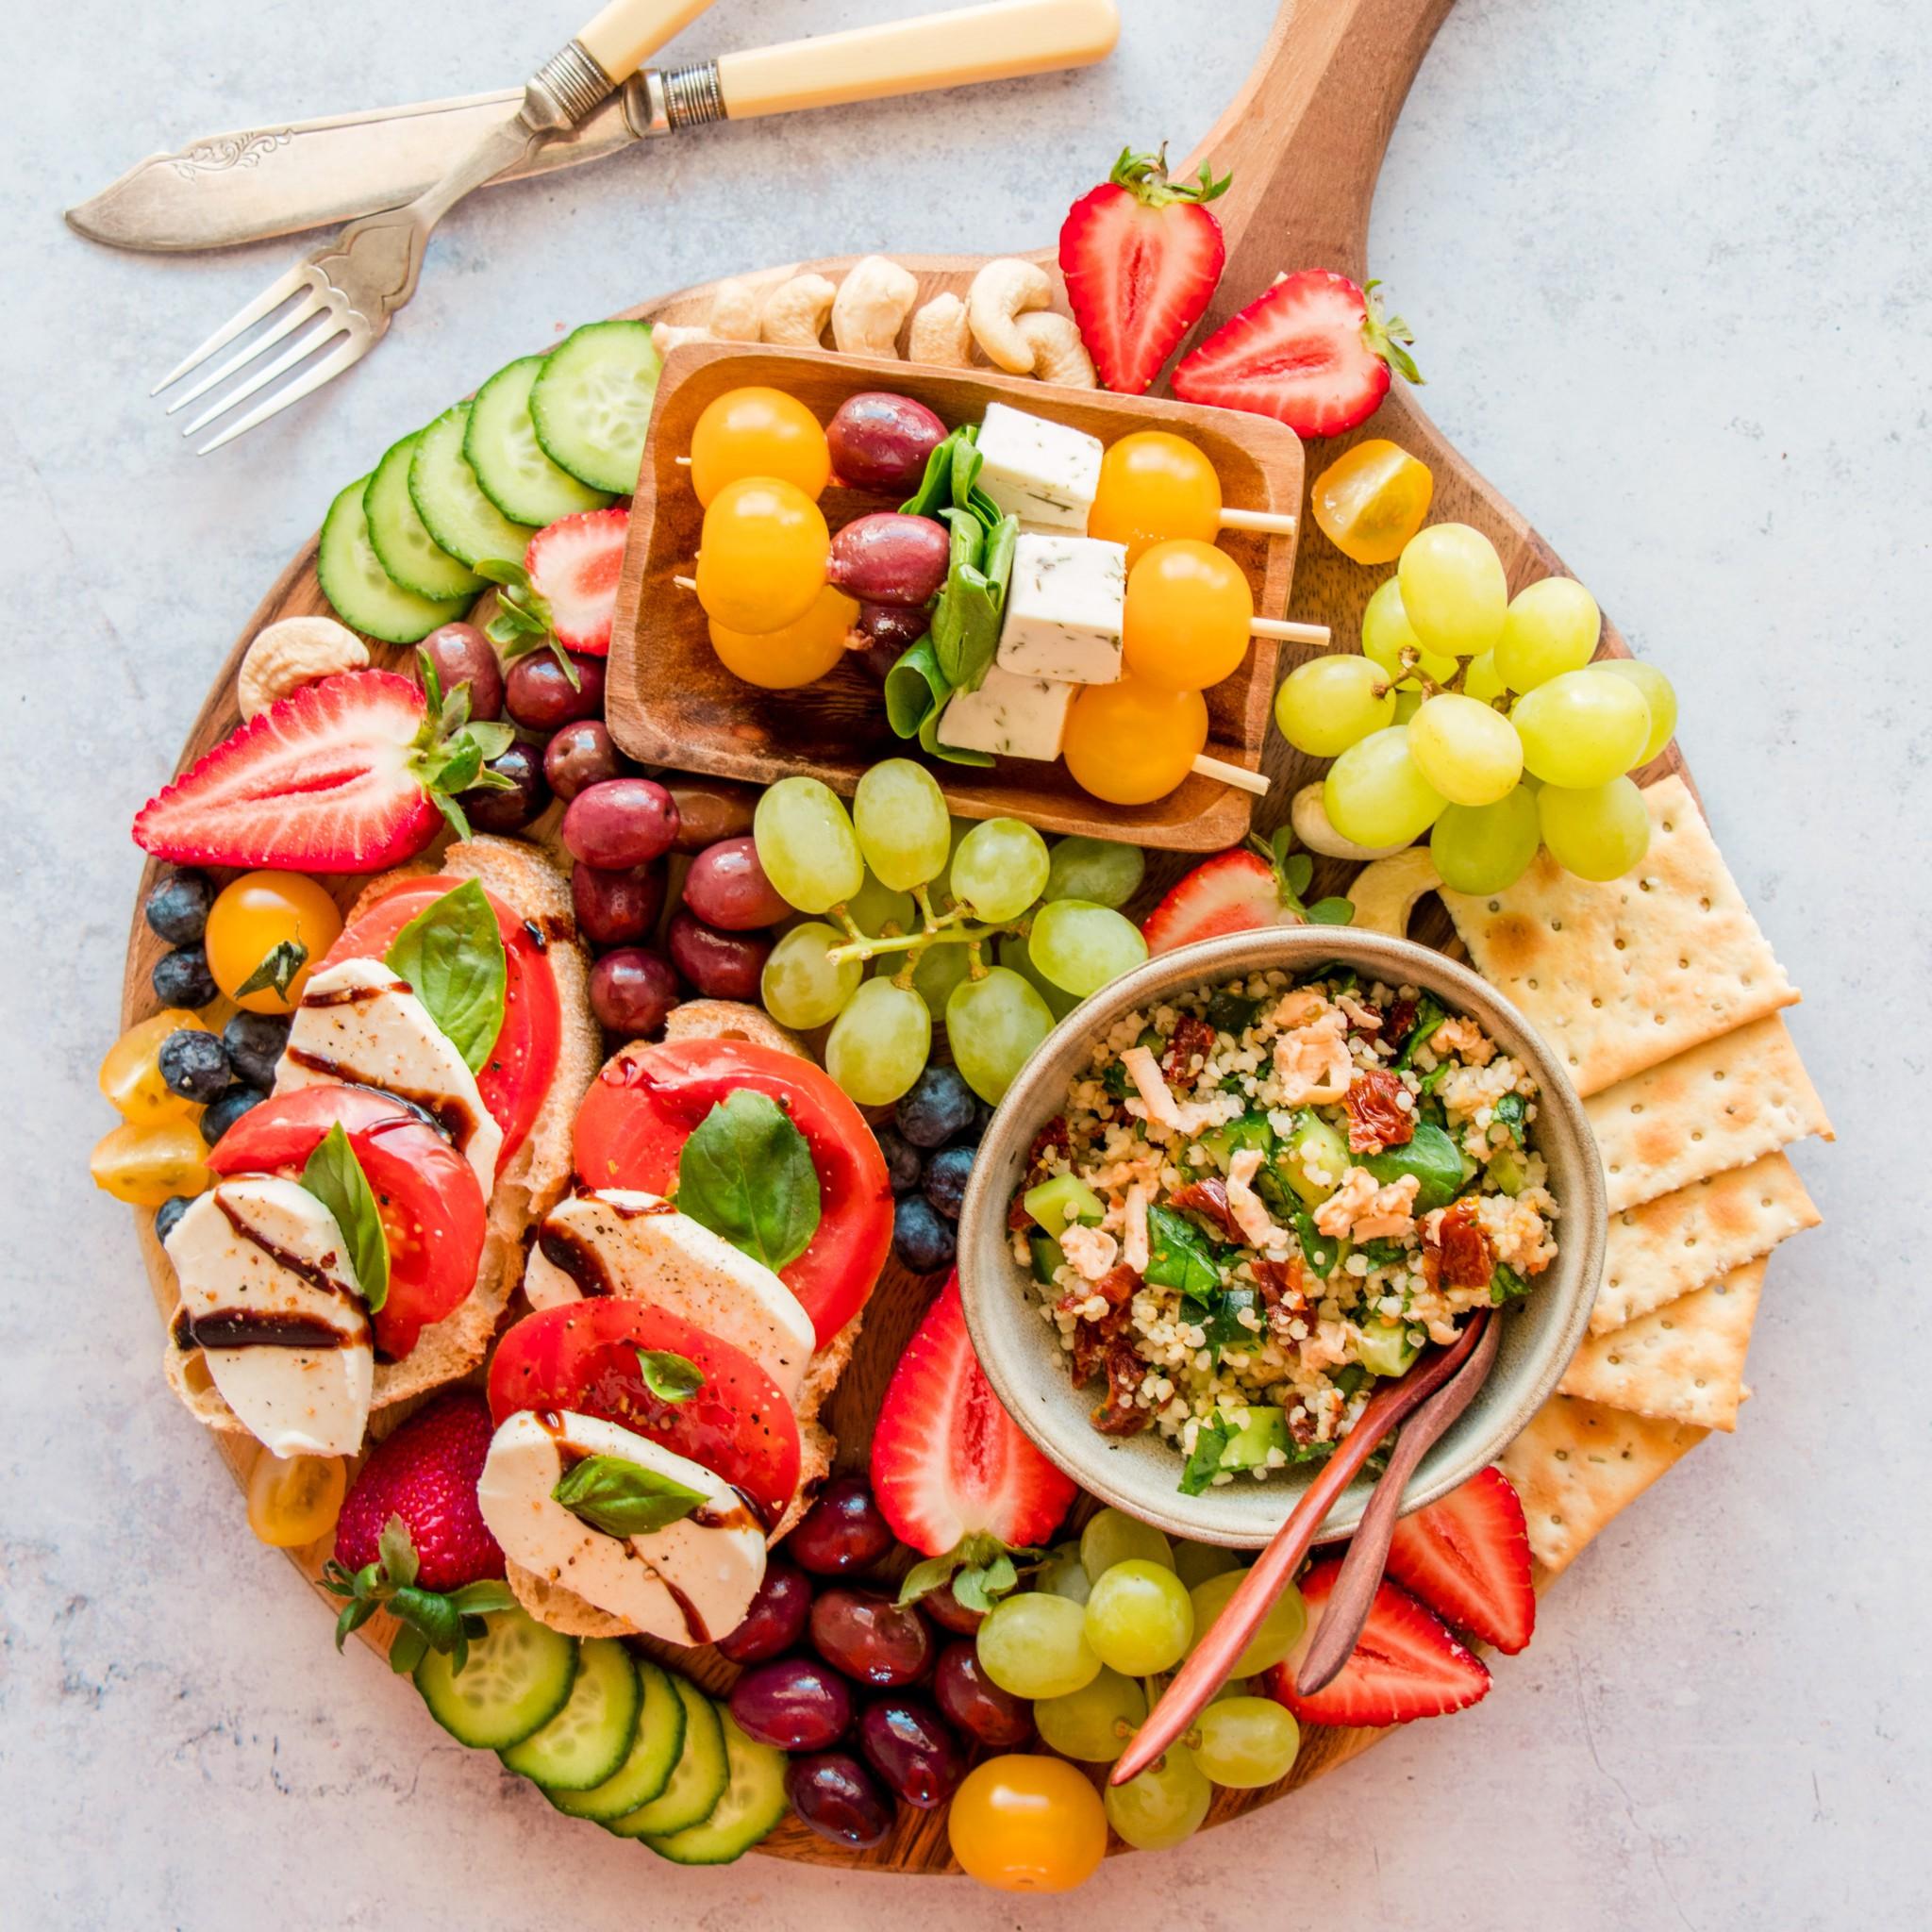 Vegan Antipasto Cheese Platter The Tasty K